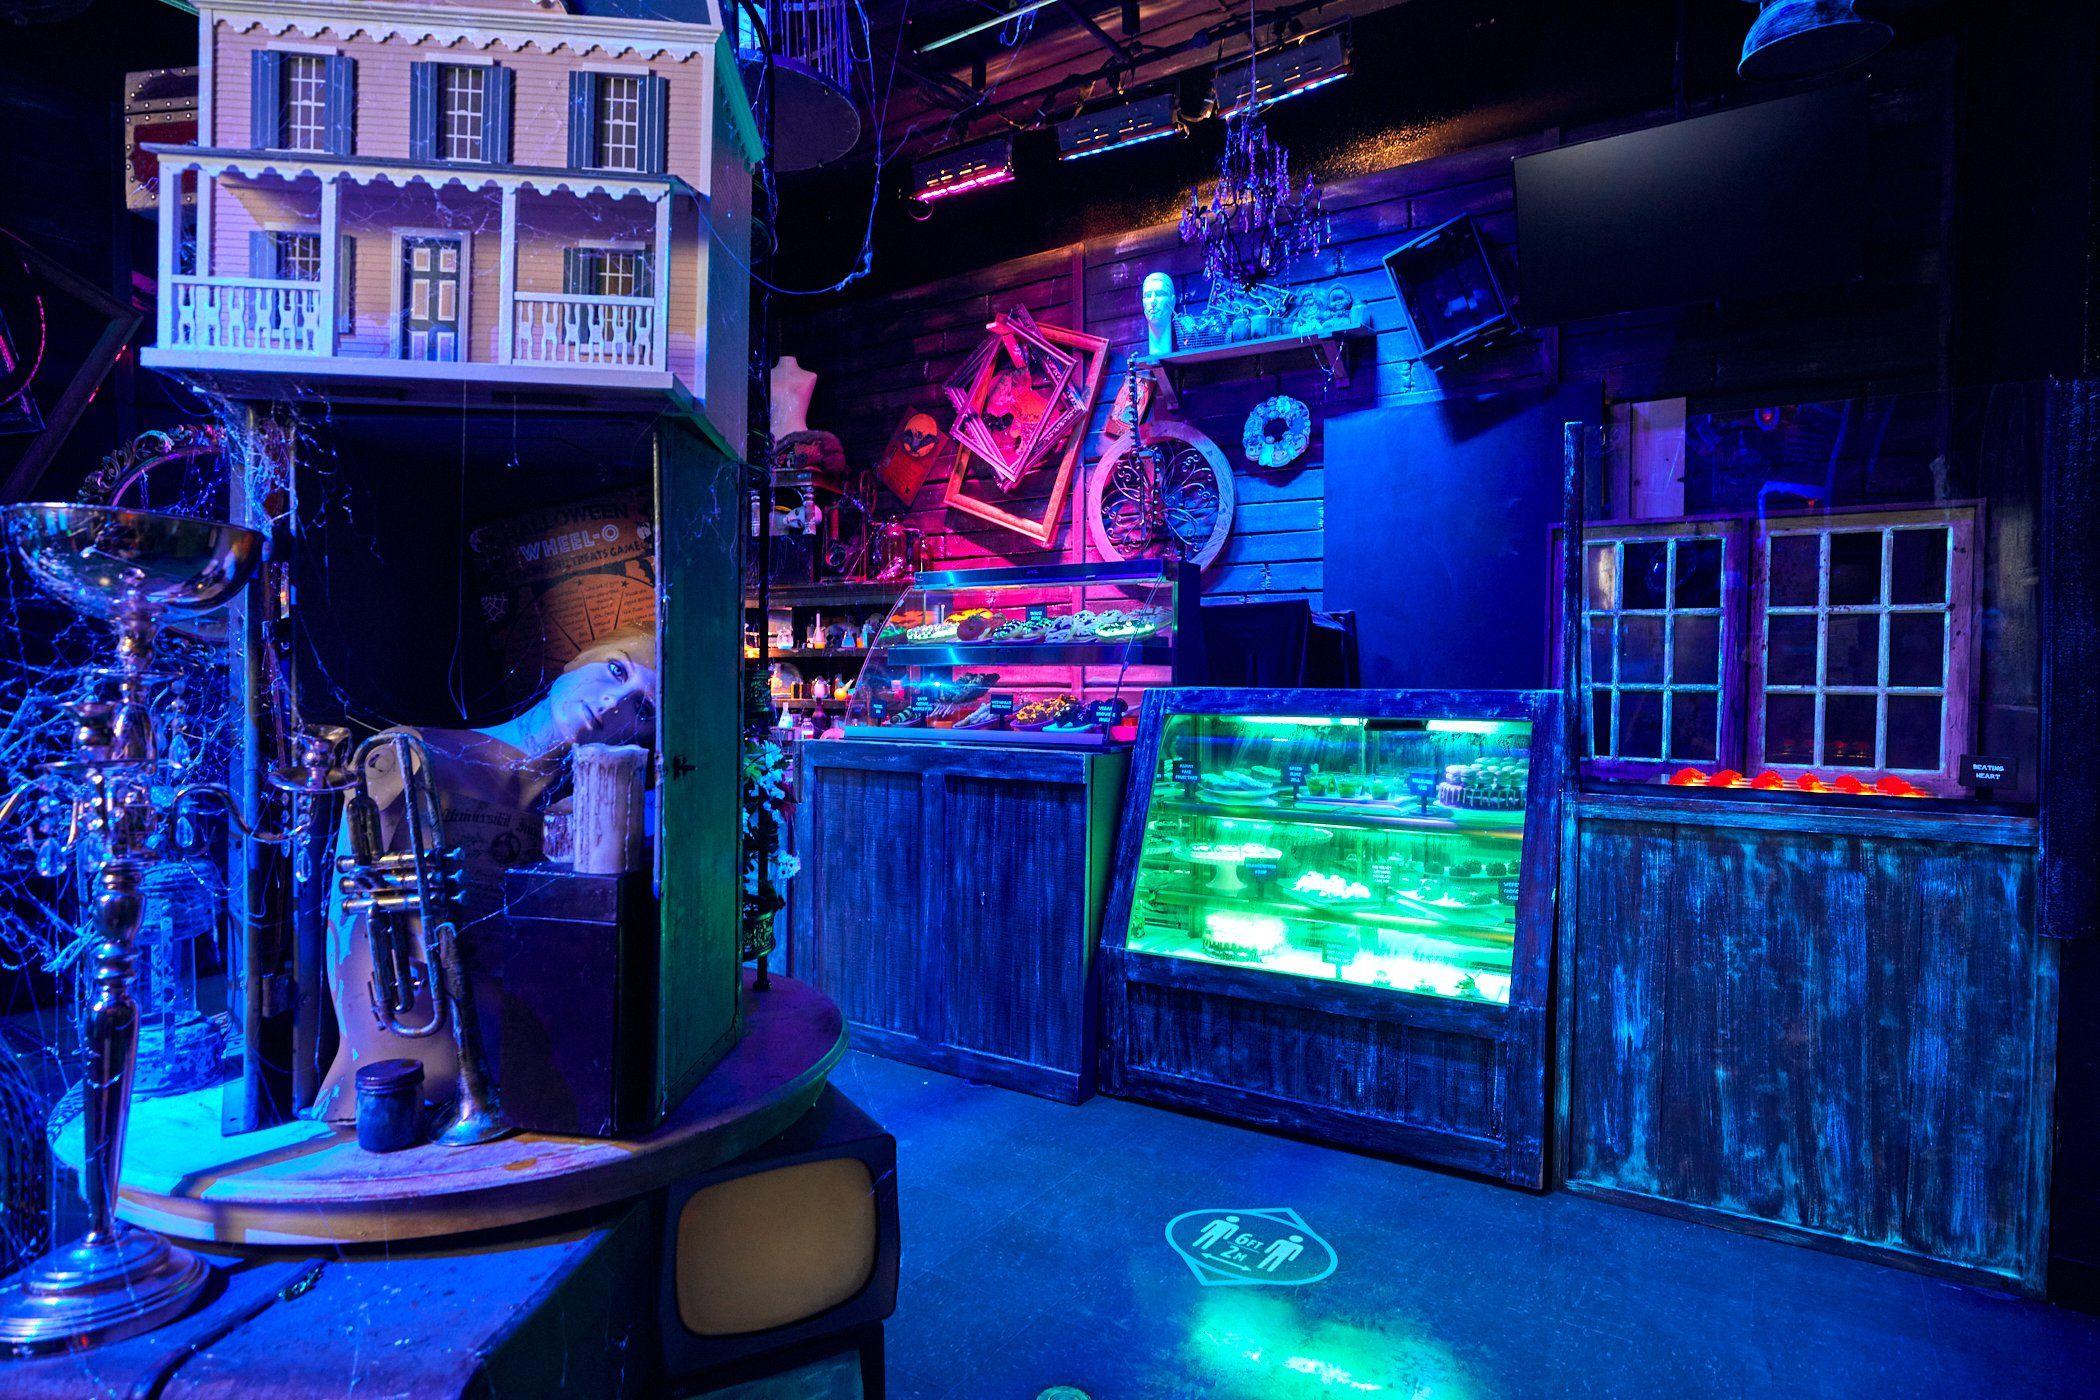 Halloween 2020 When Debut Beetlejuice Room & New Snacks debut at Halloween Horror Nights